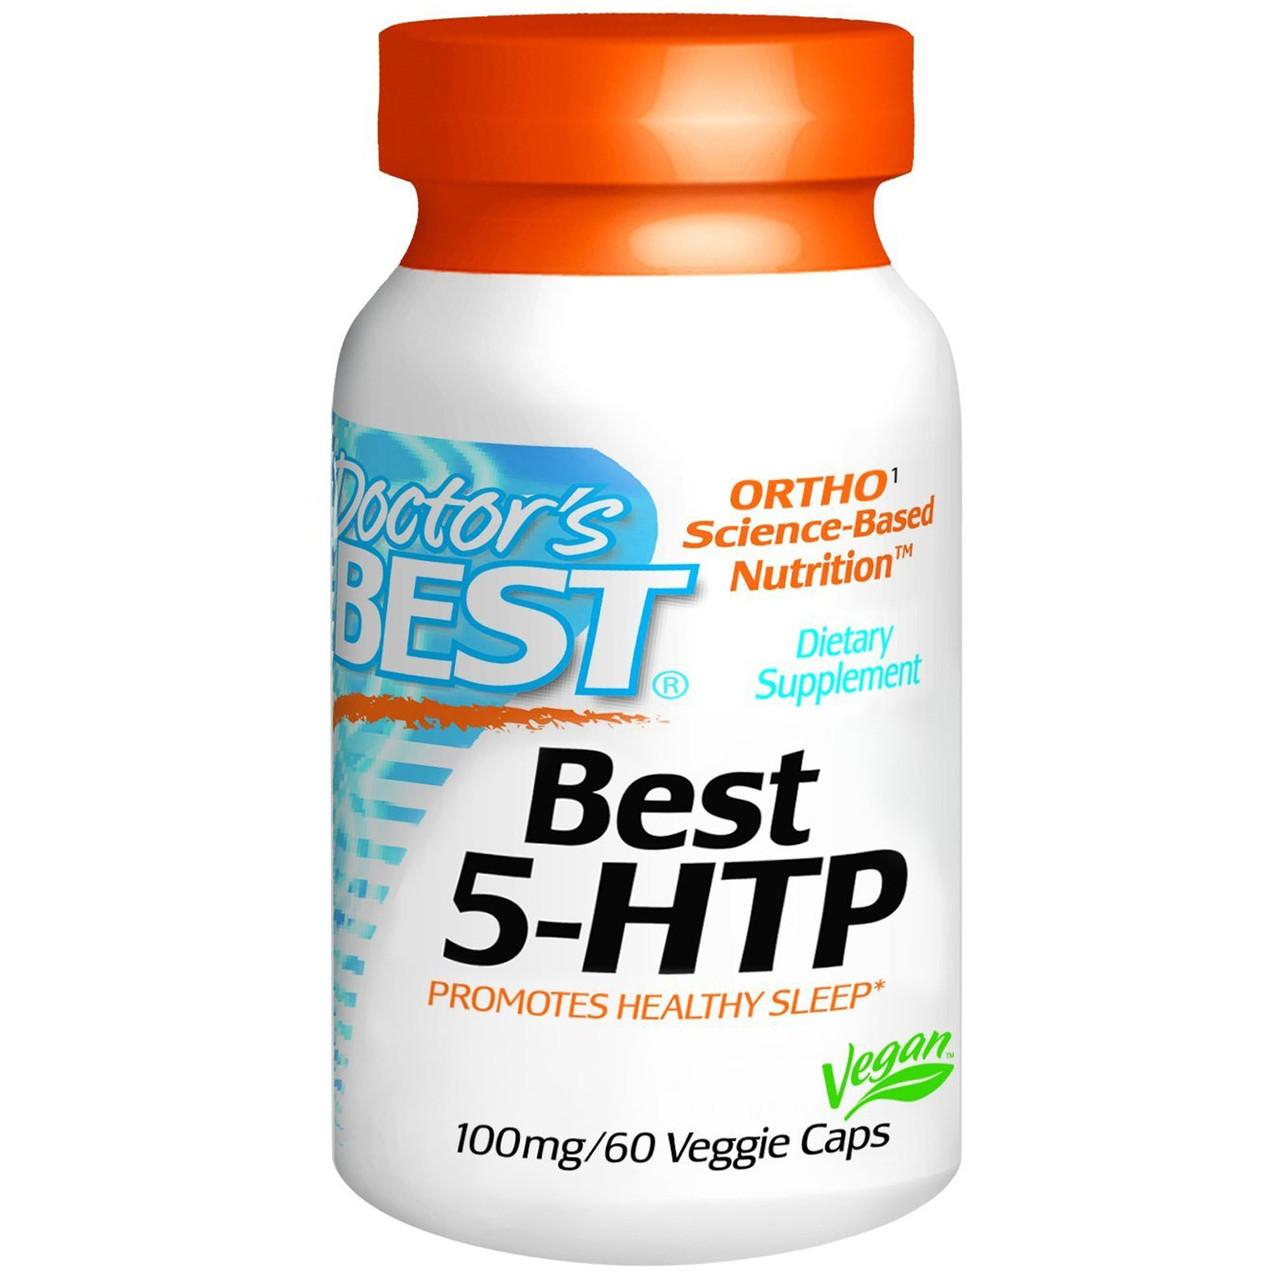 Doctor's Best Best 5-HTP 100 mg